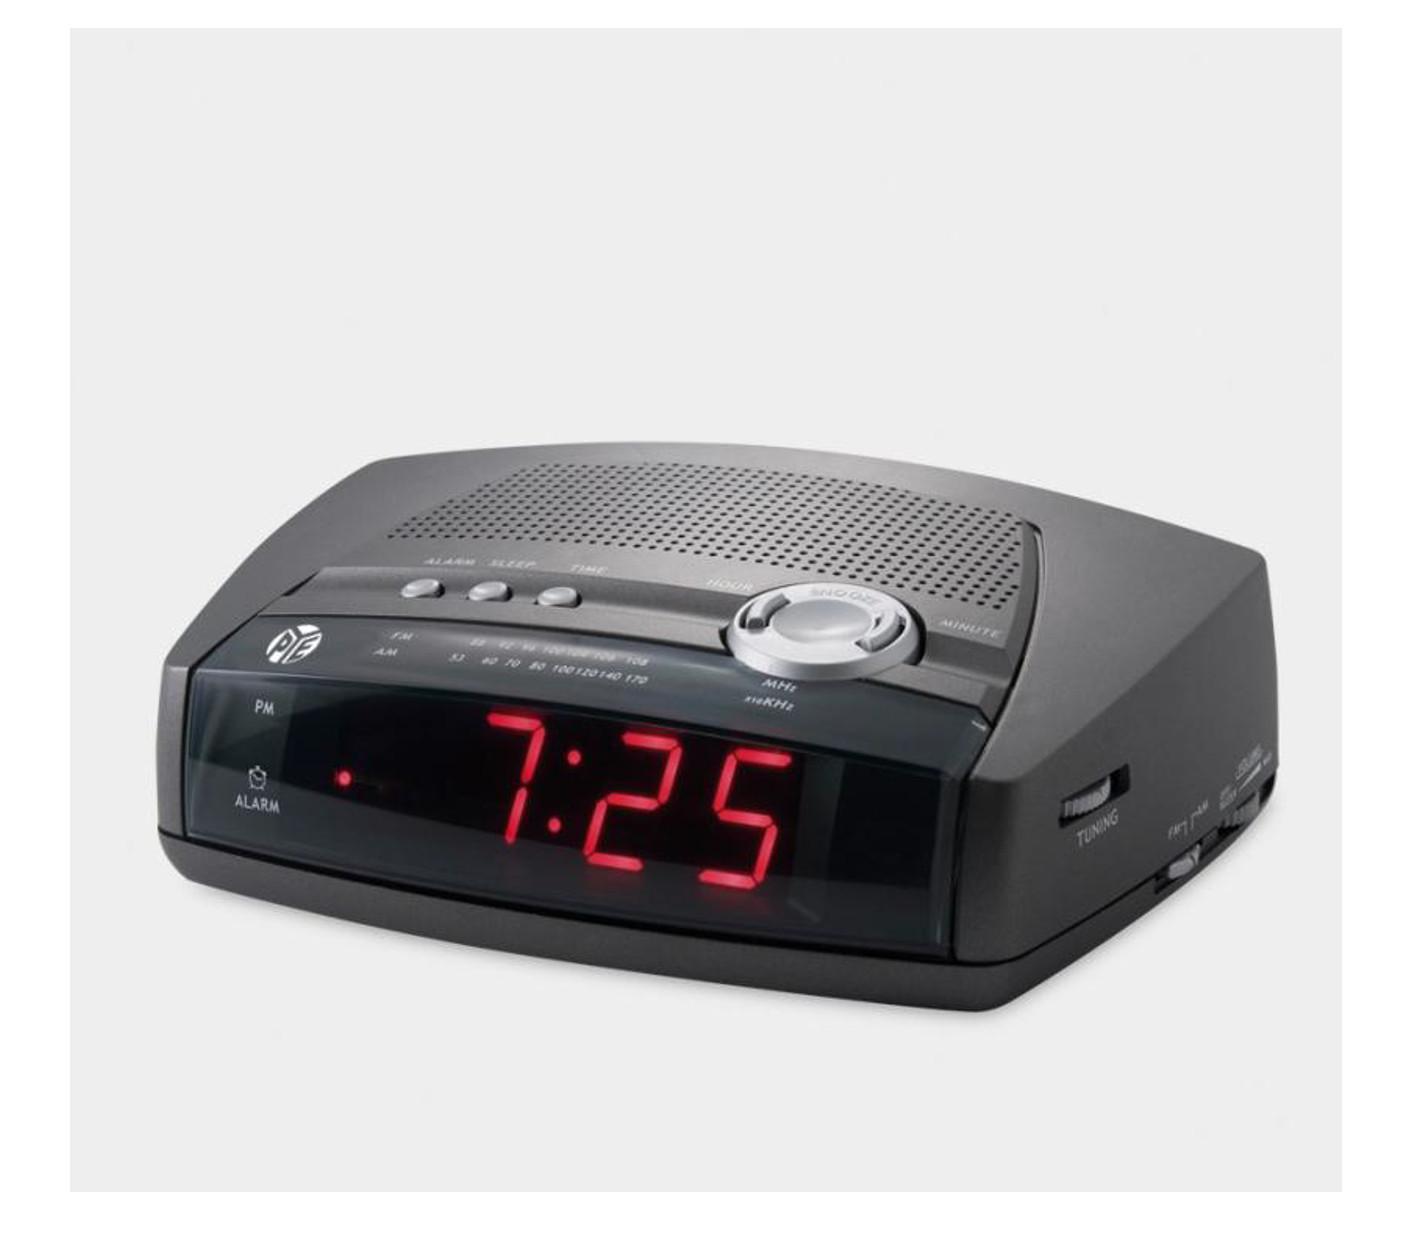 pye am fm alarm clock radio. Black Bedroom Furniture Sets. Home Design Ideas